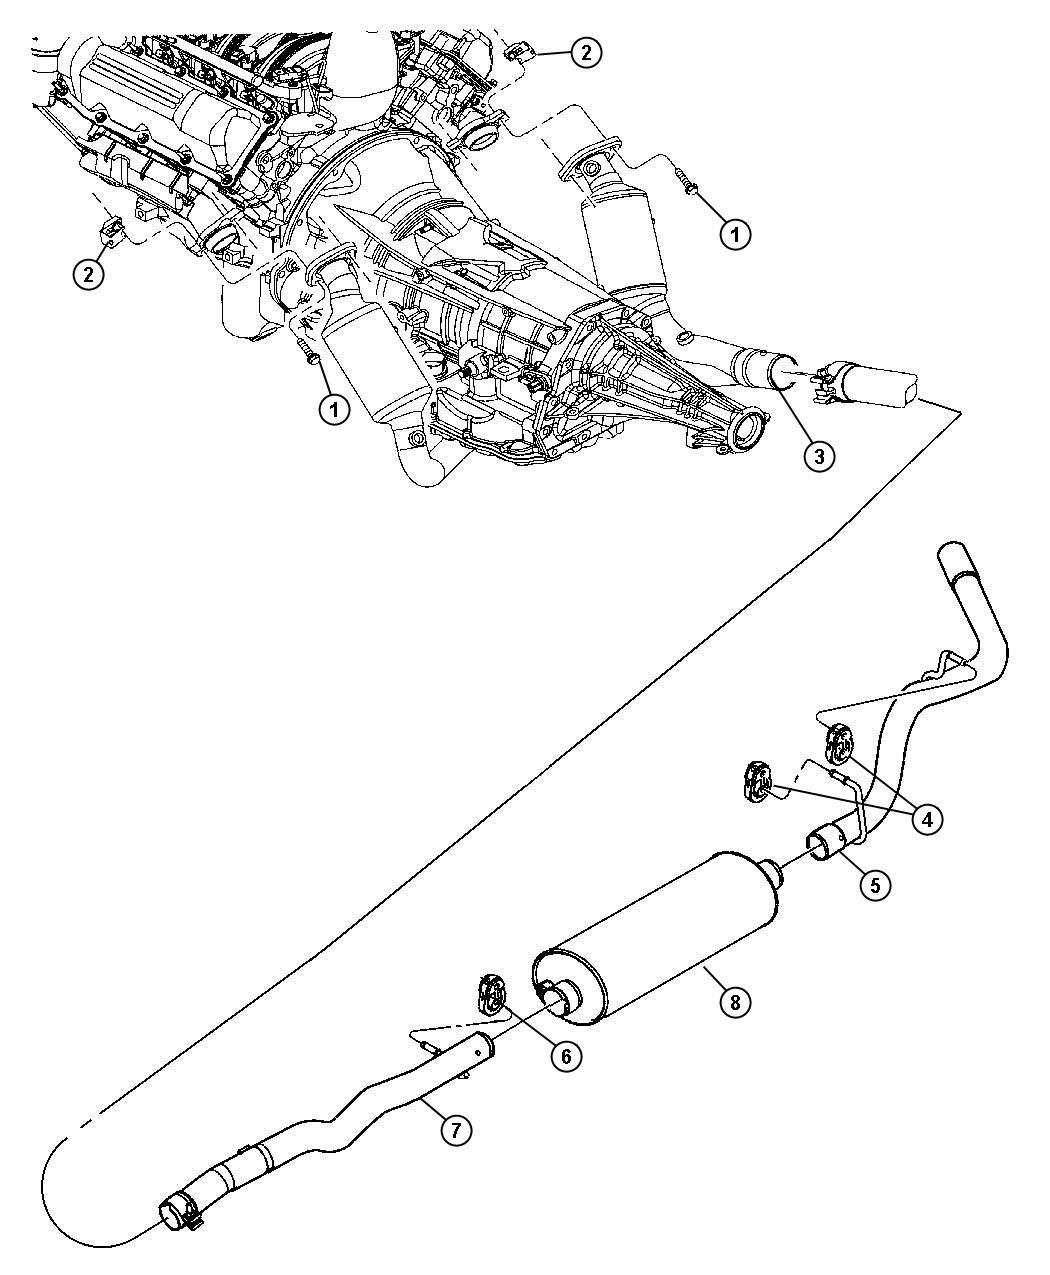 dodge dakota exhaust system diagram